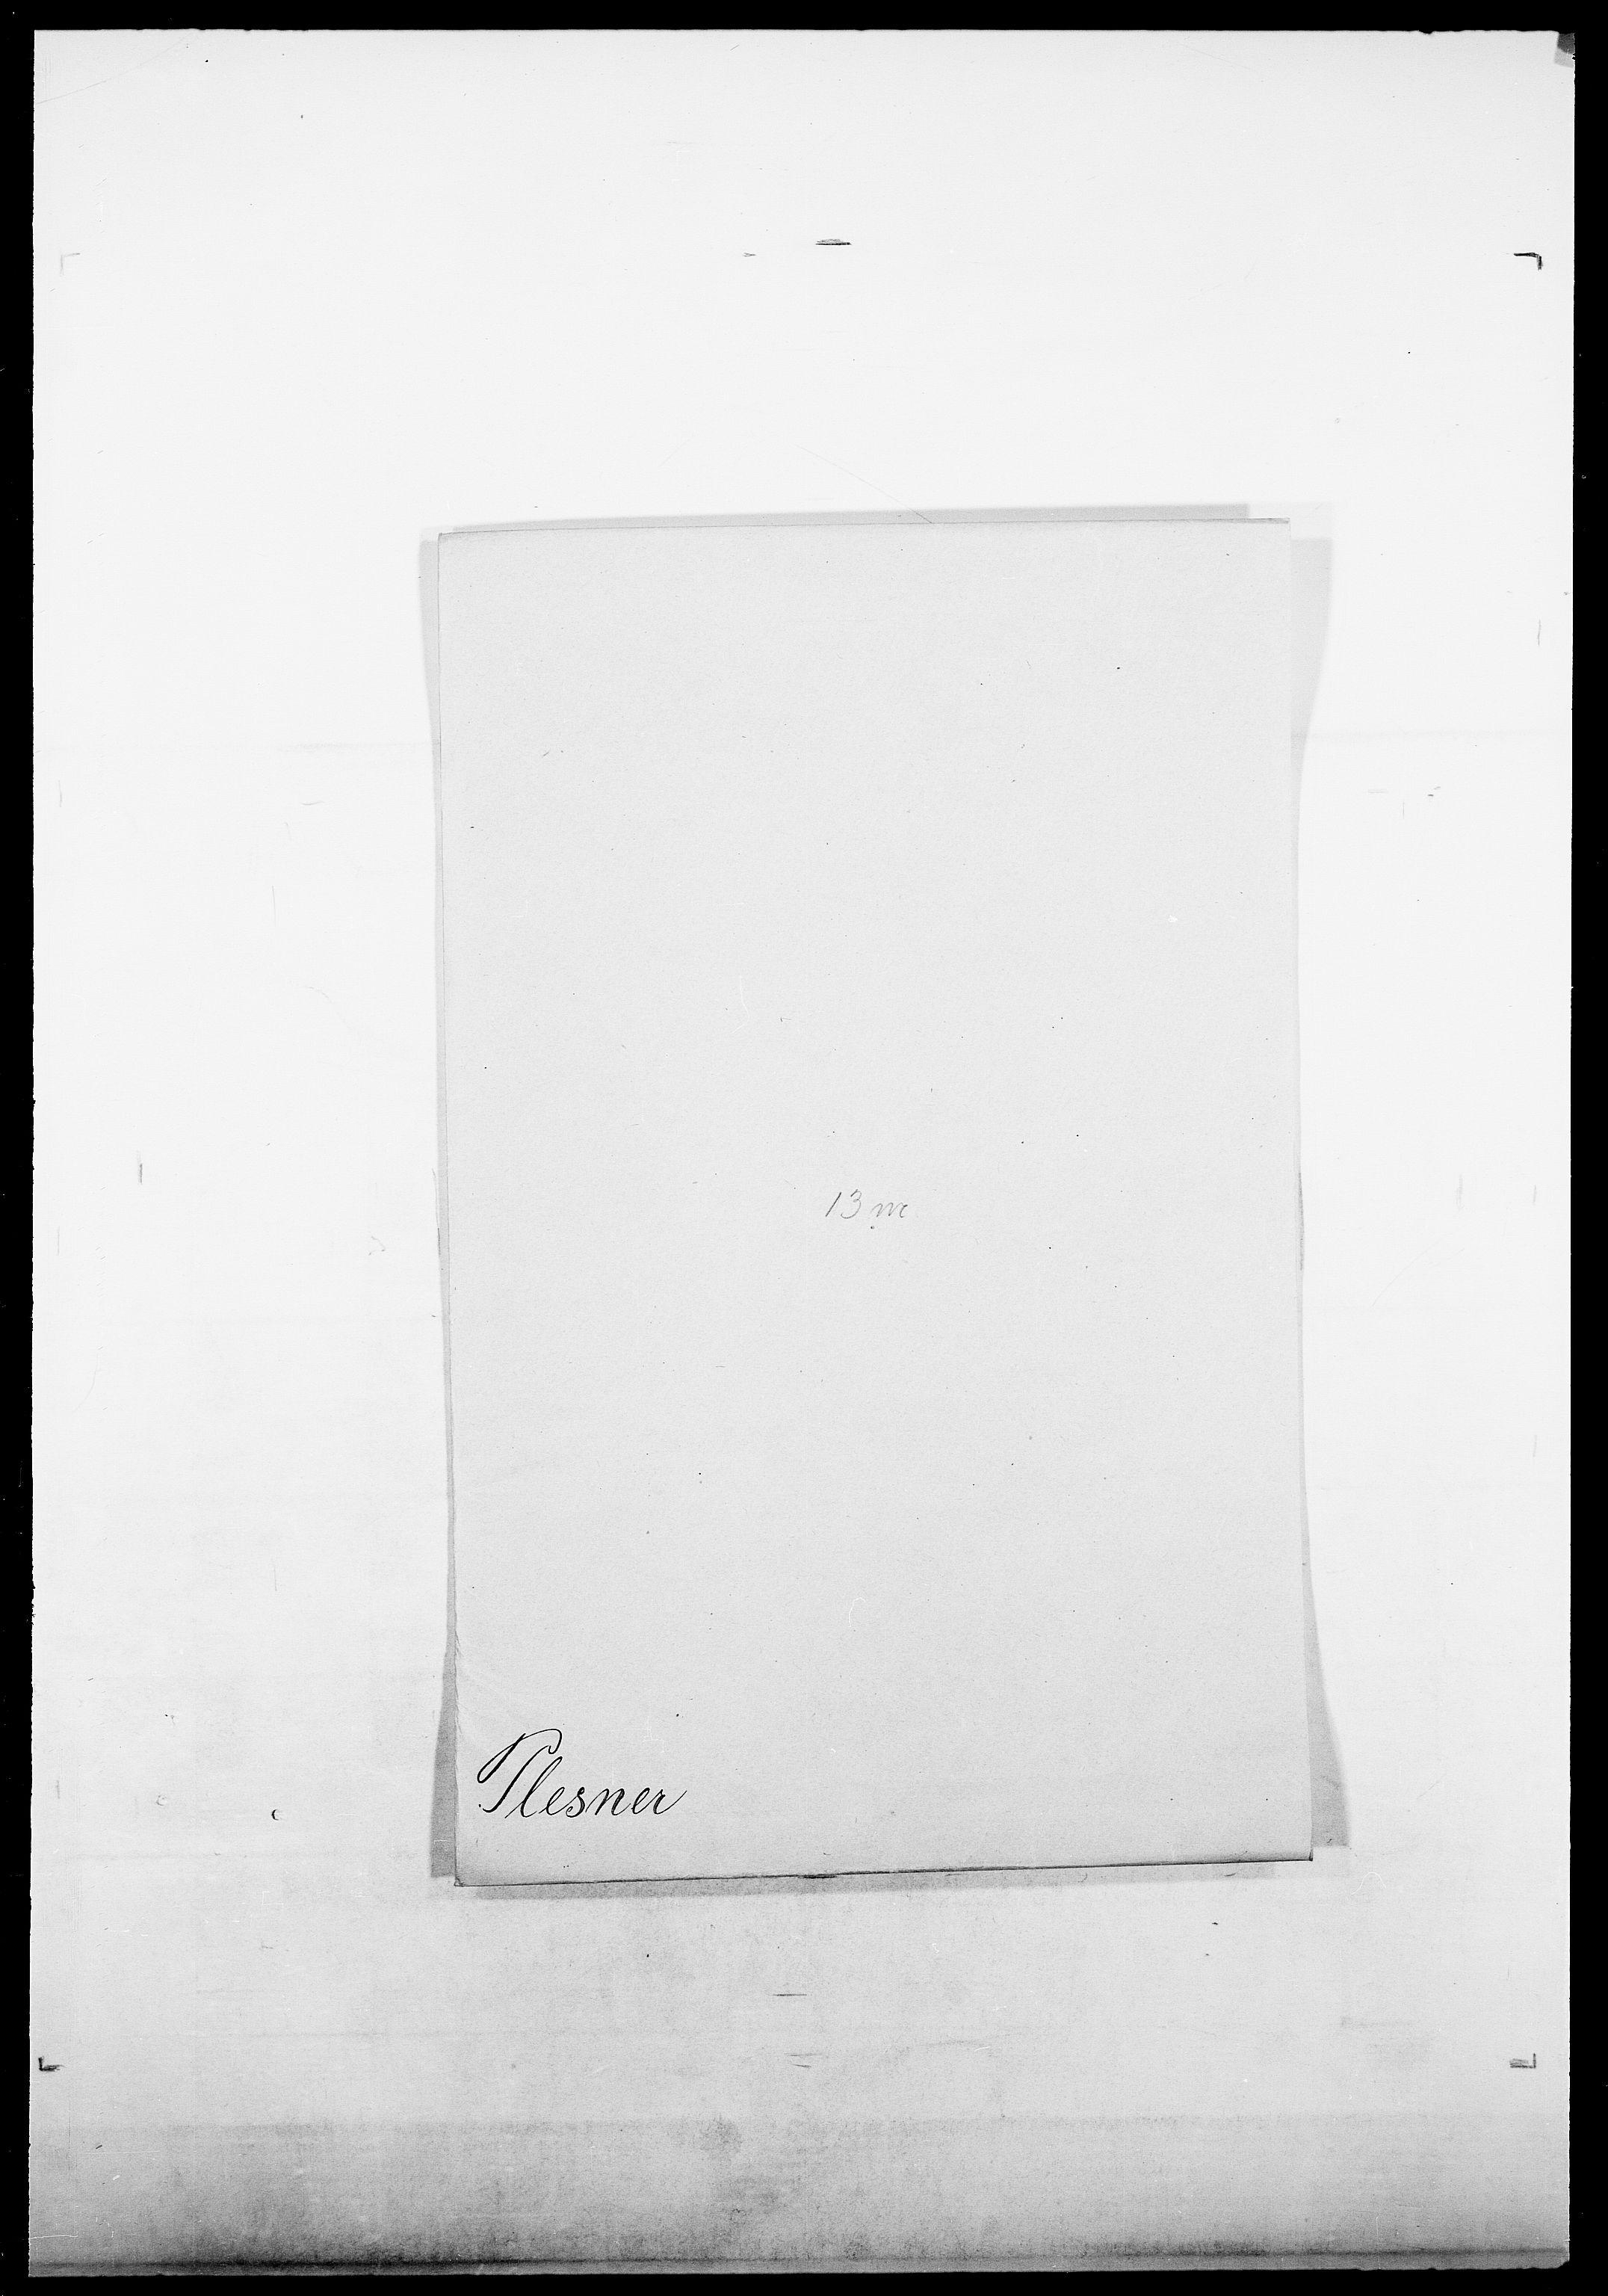 SAO, Delgobe, Charles Antoine - samling, D/Da/L0031: de Place - Raaum, s. 98